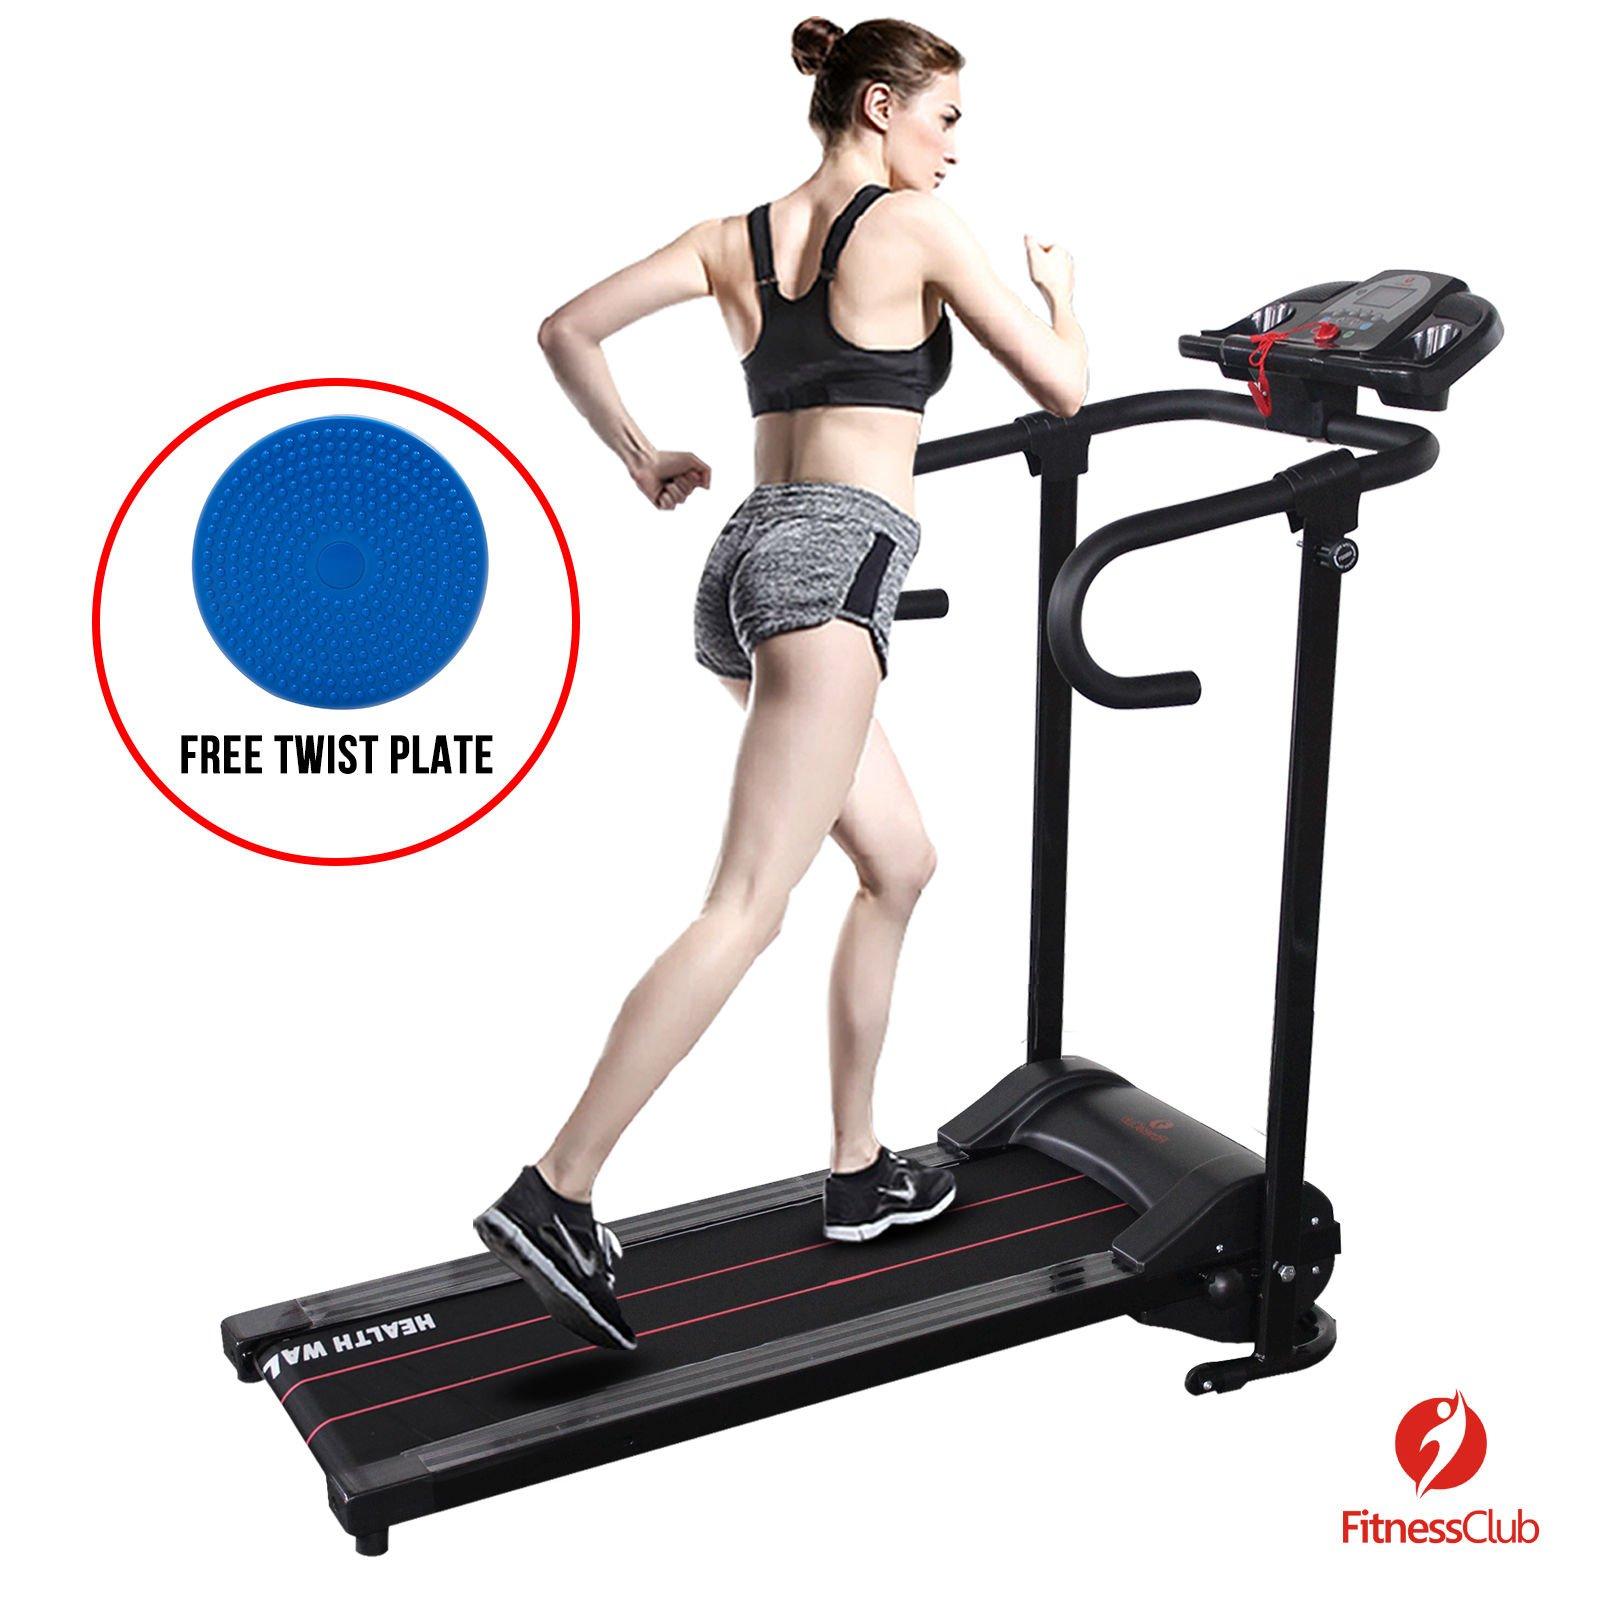 Portable 500W Folding Electric Motorized Treadmill Running Gym Fitness Machine